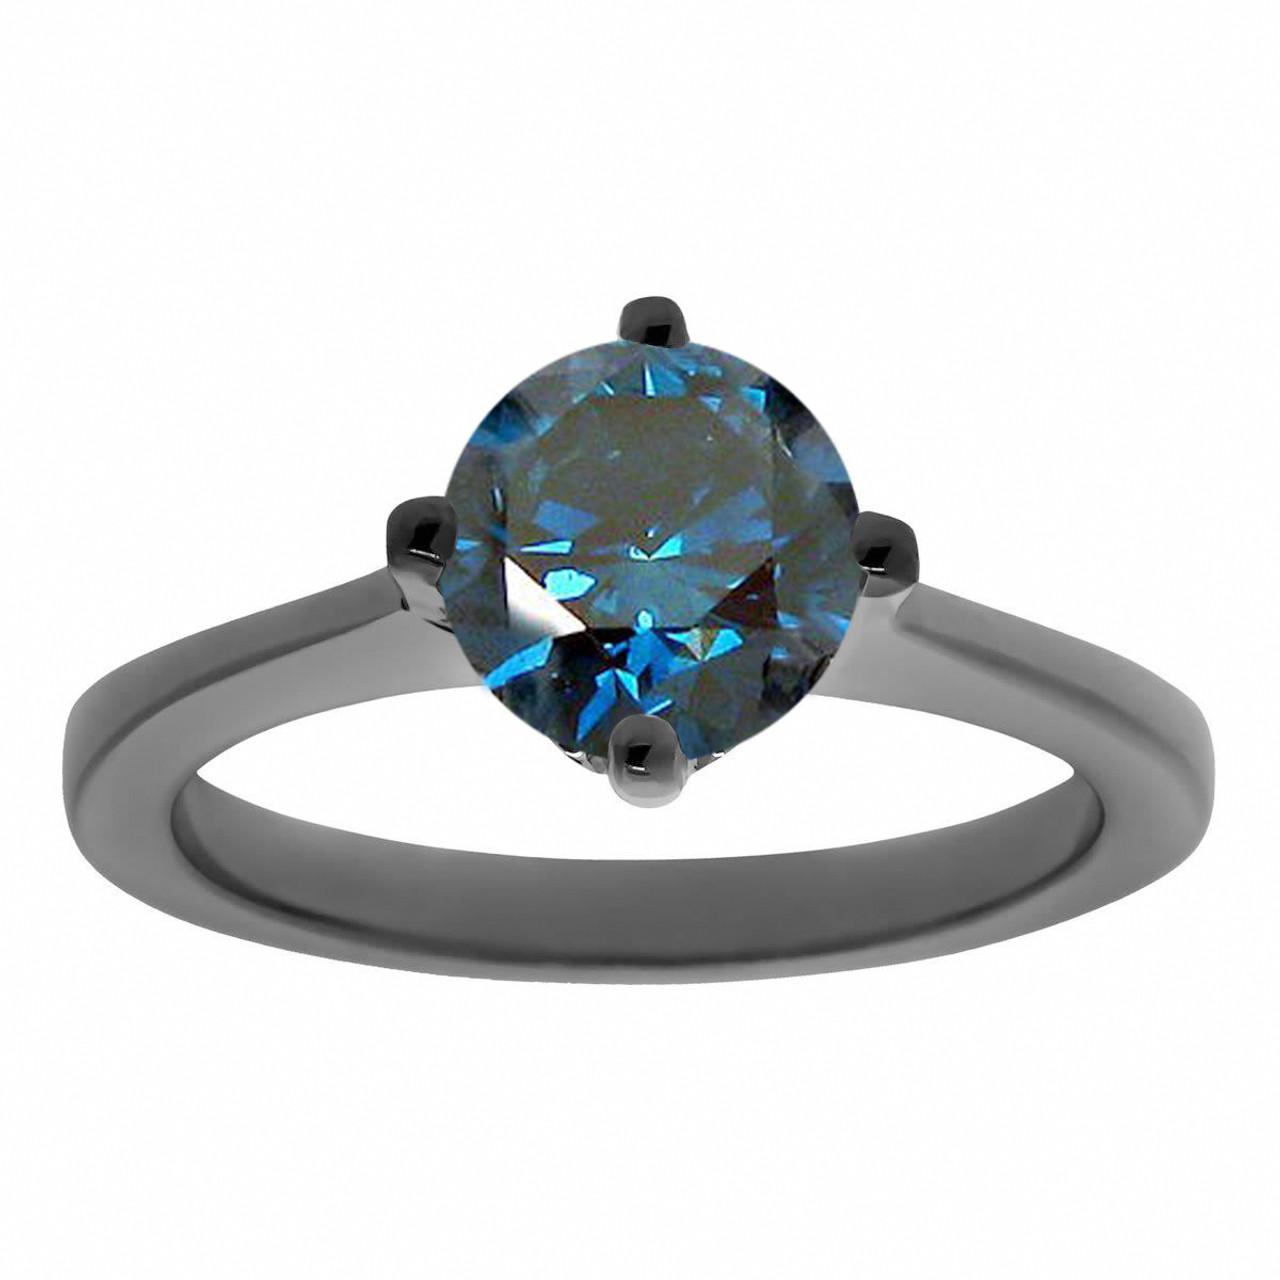 Blue Diamond Engagement Ring Vintage Solitaire Engagement Ring Unique Bridal Ring 1 22 Carat 14k Black Gold Gallery Design Handmade